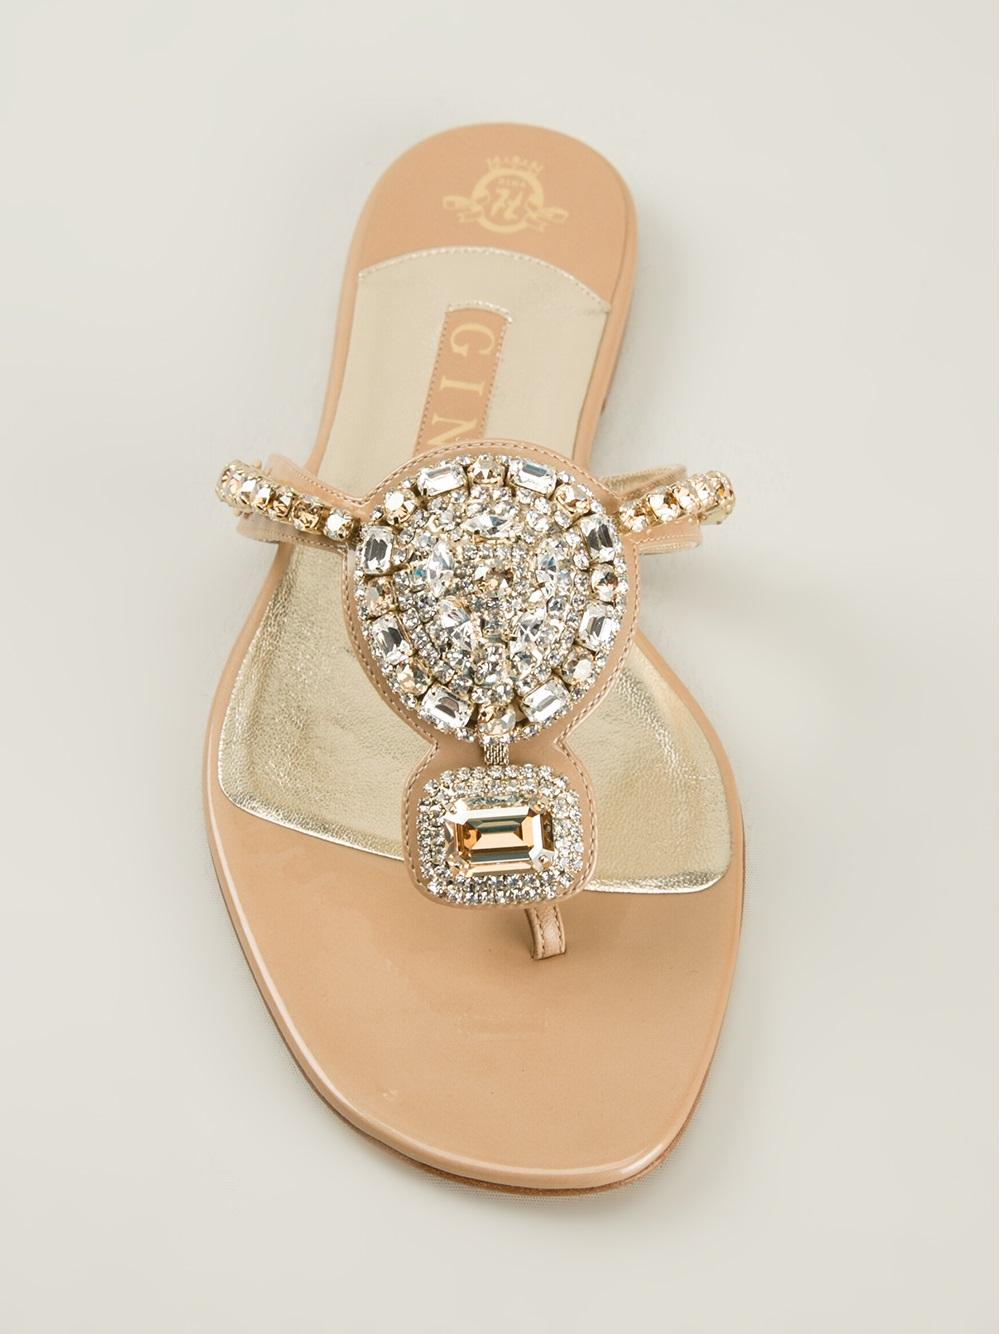 Gina Crystal Embellished Sandals in Natural   Lyst